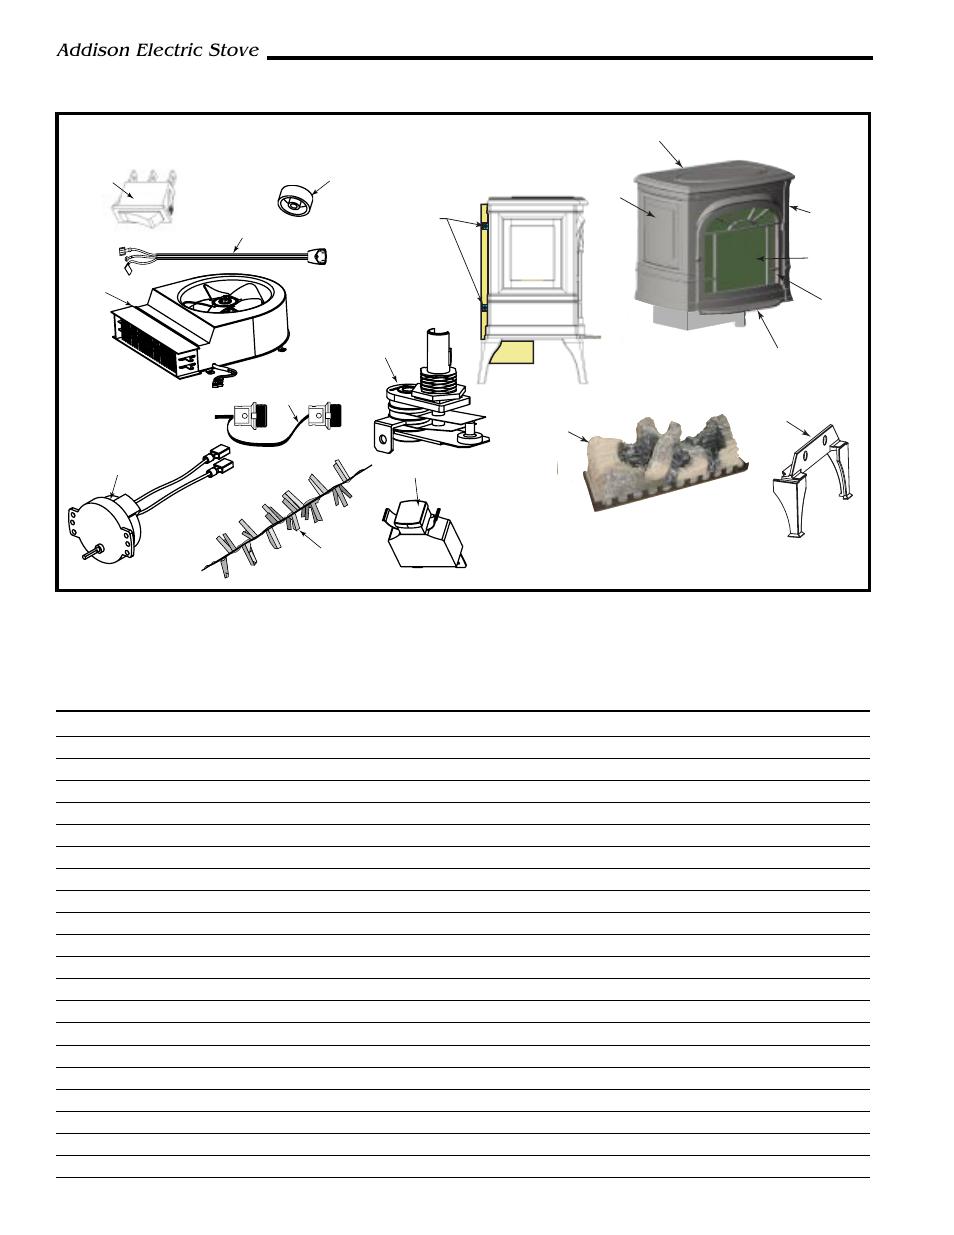 Addison Freestanding Electric Stove  Addison Electric